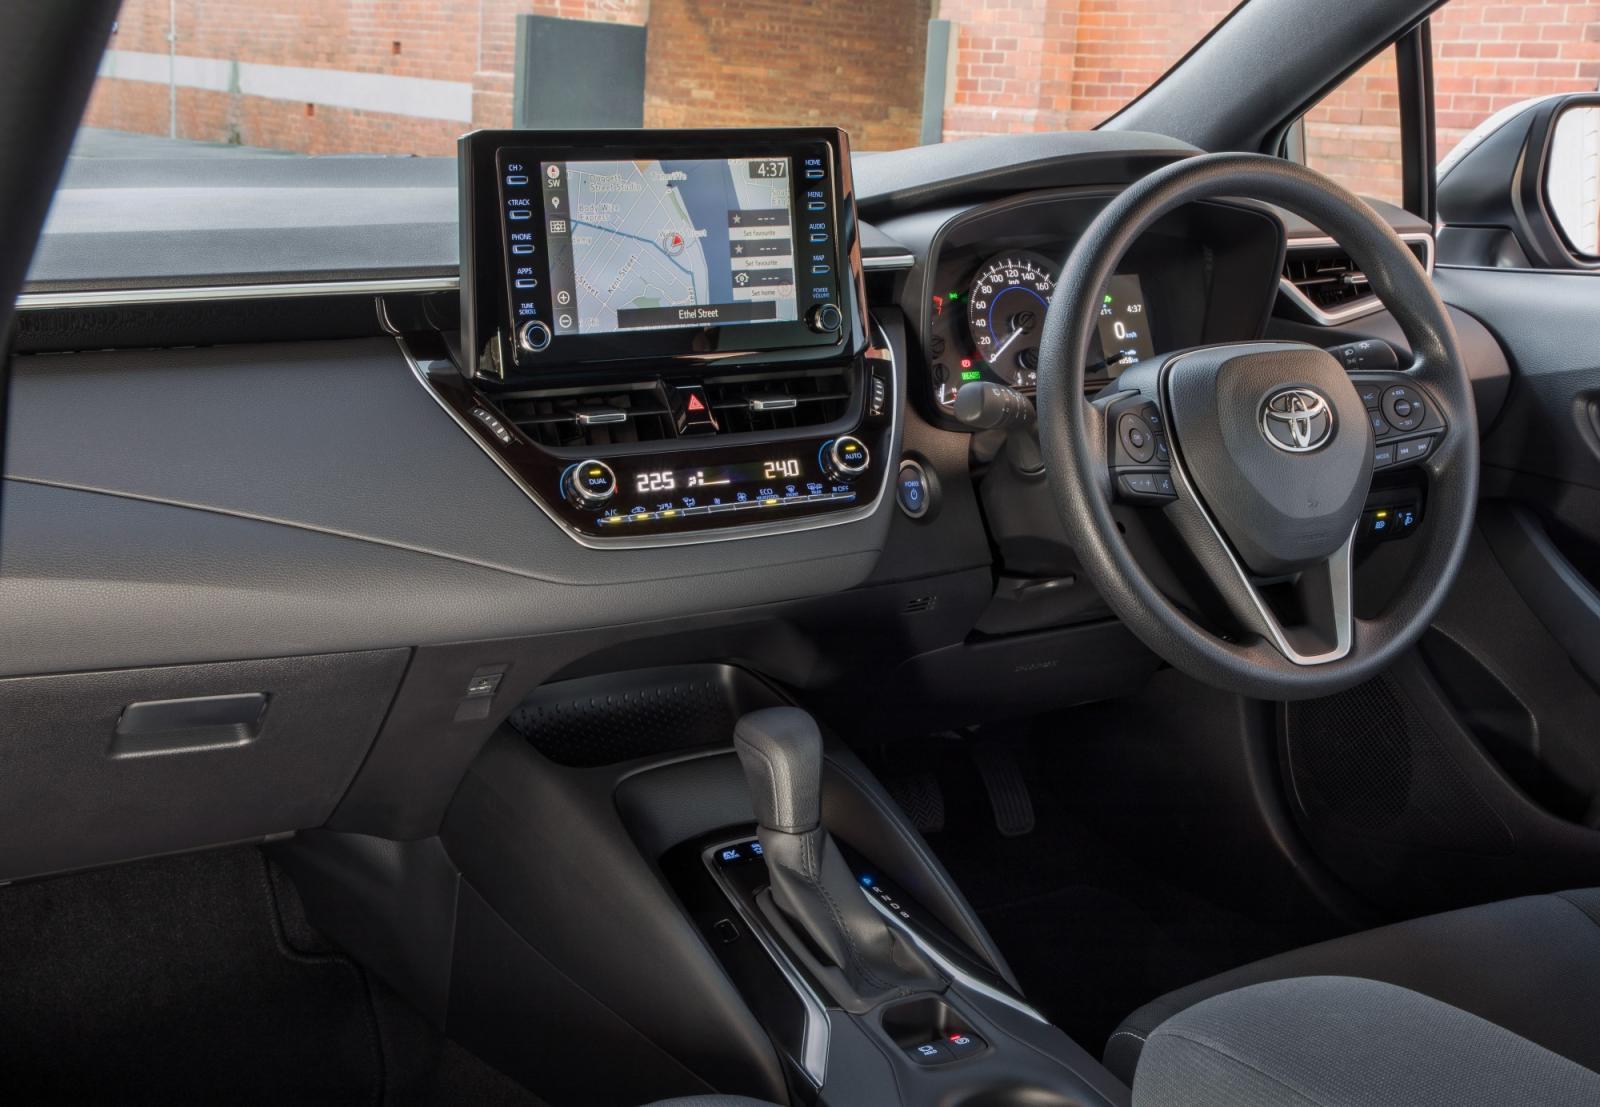 Toyota Corolla Hatch (2019) in SA soon - Cars co za